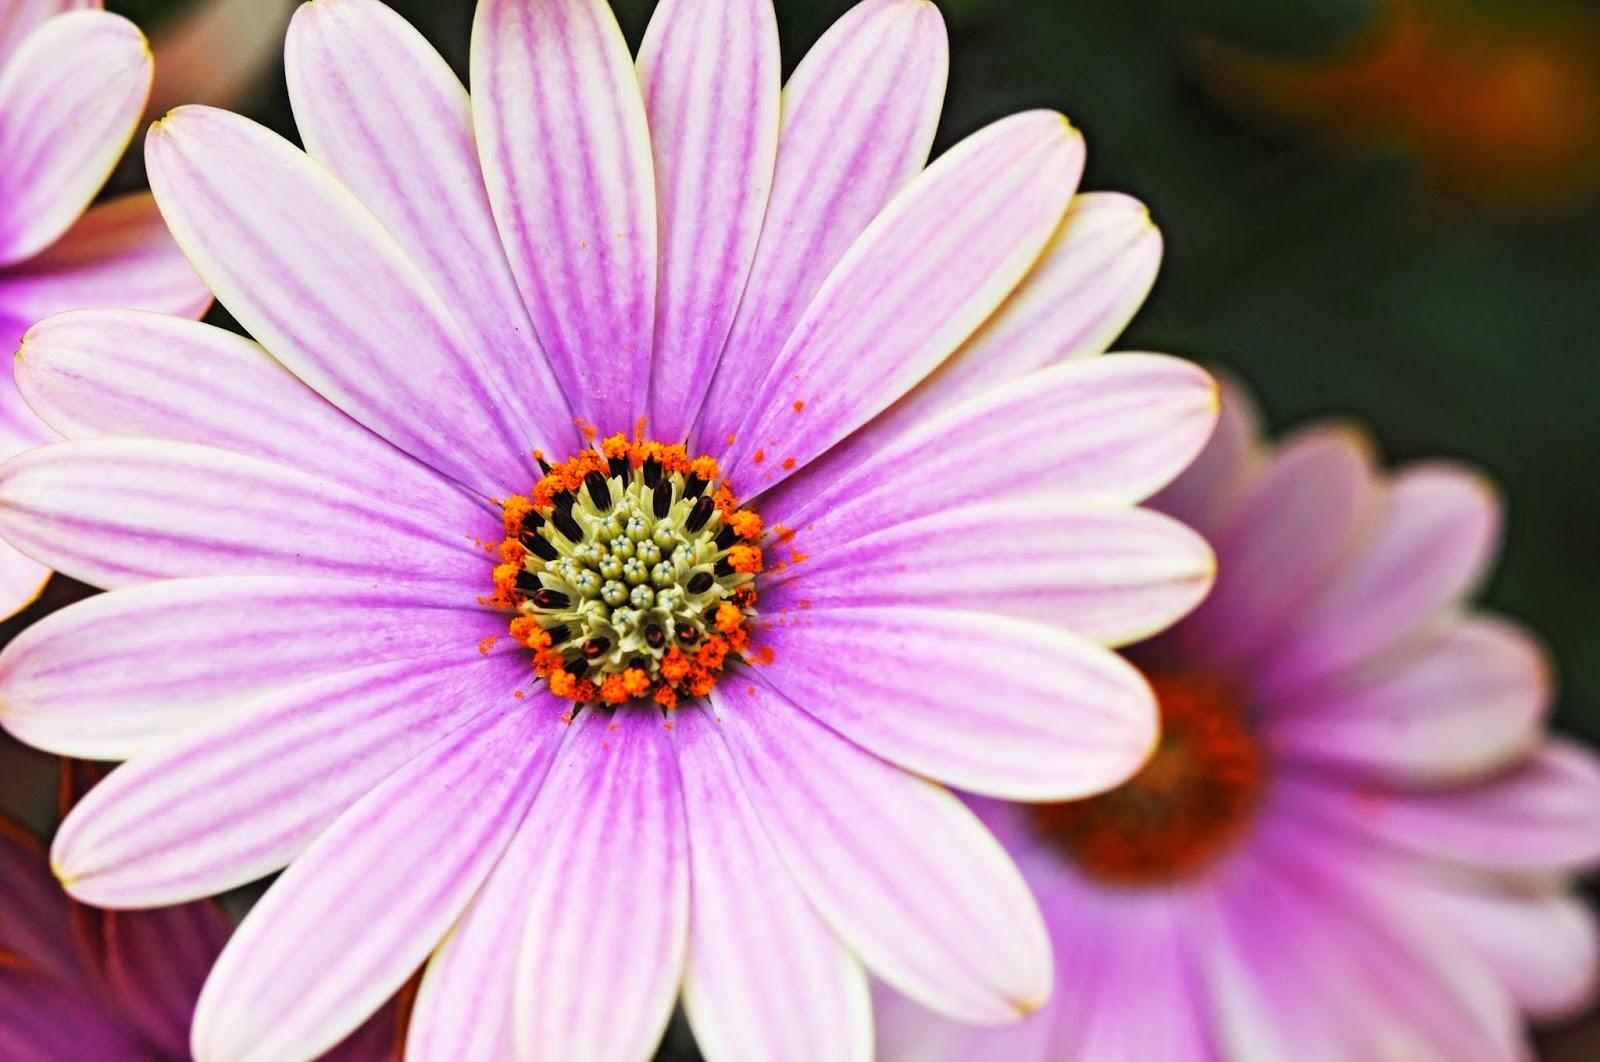 The meaning of flowers daisy innocence dayton ohio weddings the meaning of flowers daisy innocence izmirmasajfo